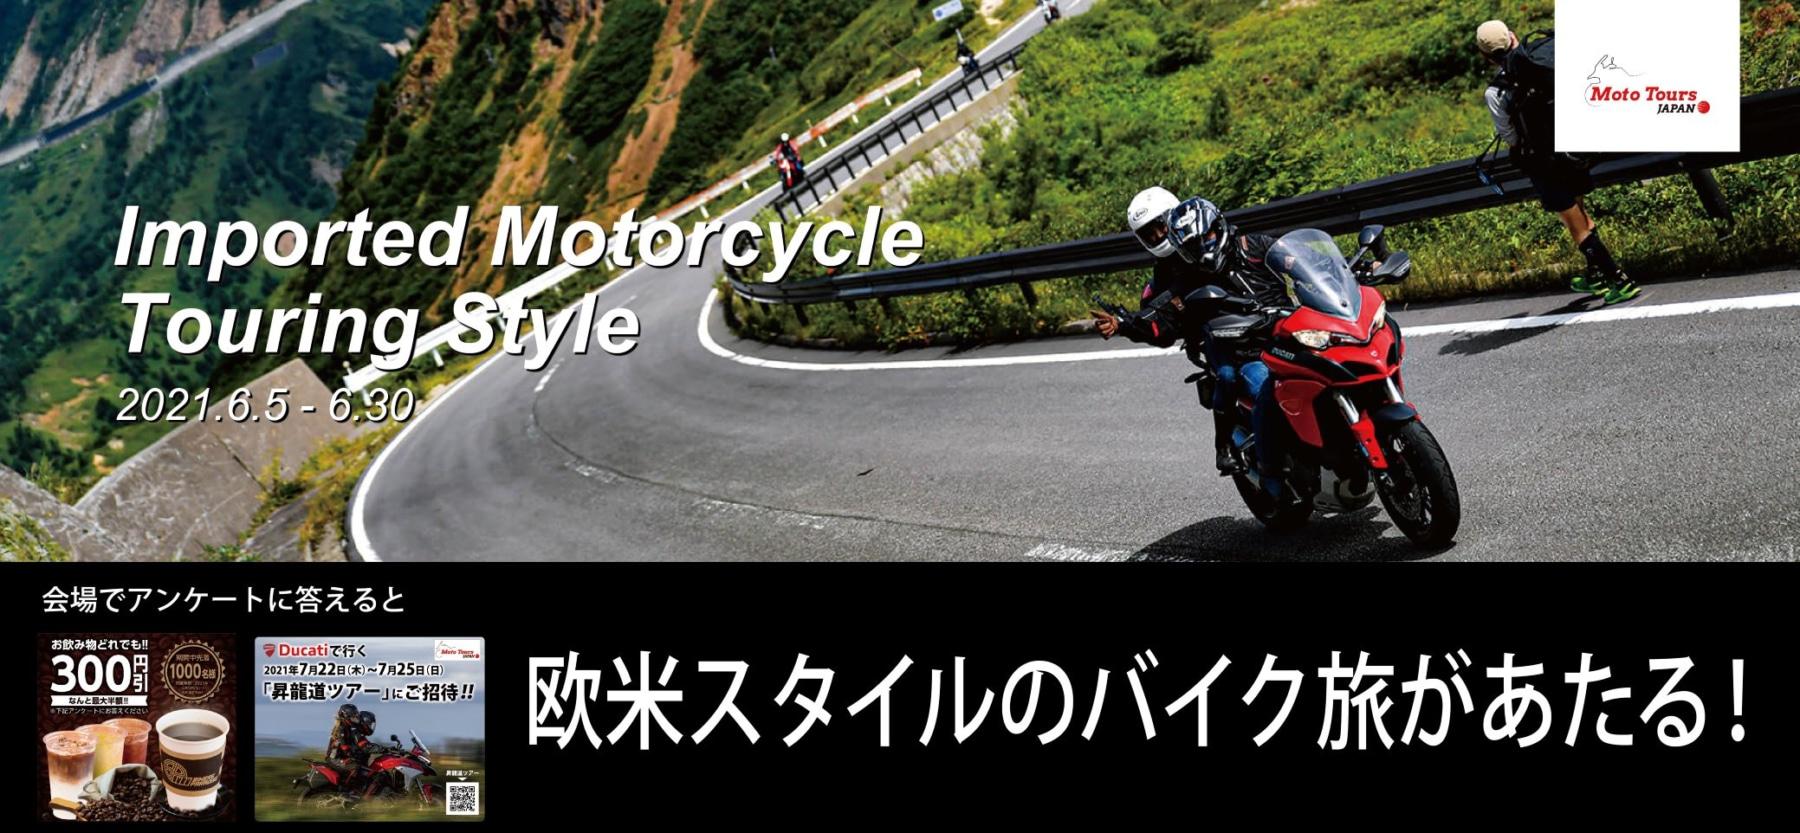 FUN旅~欧米スタイルのバイクツアー~展示イベントがバイカーズパラダイスで開催中!